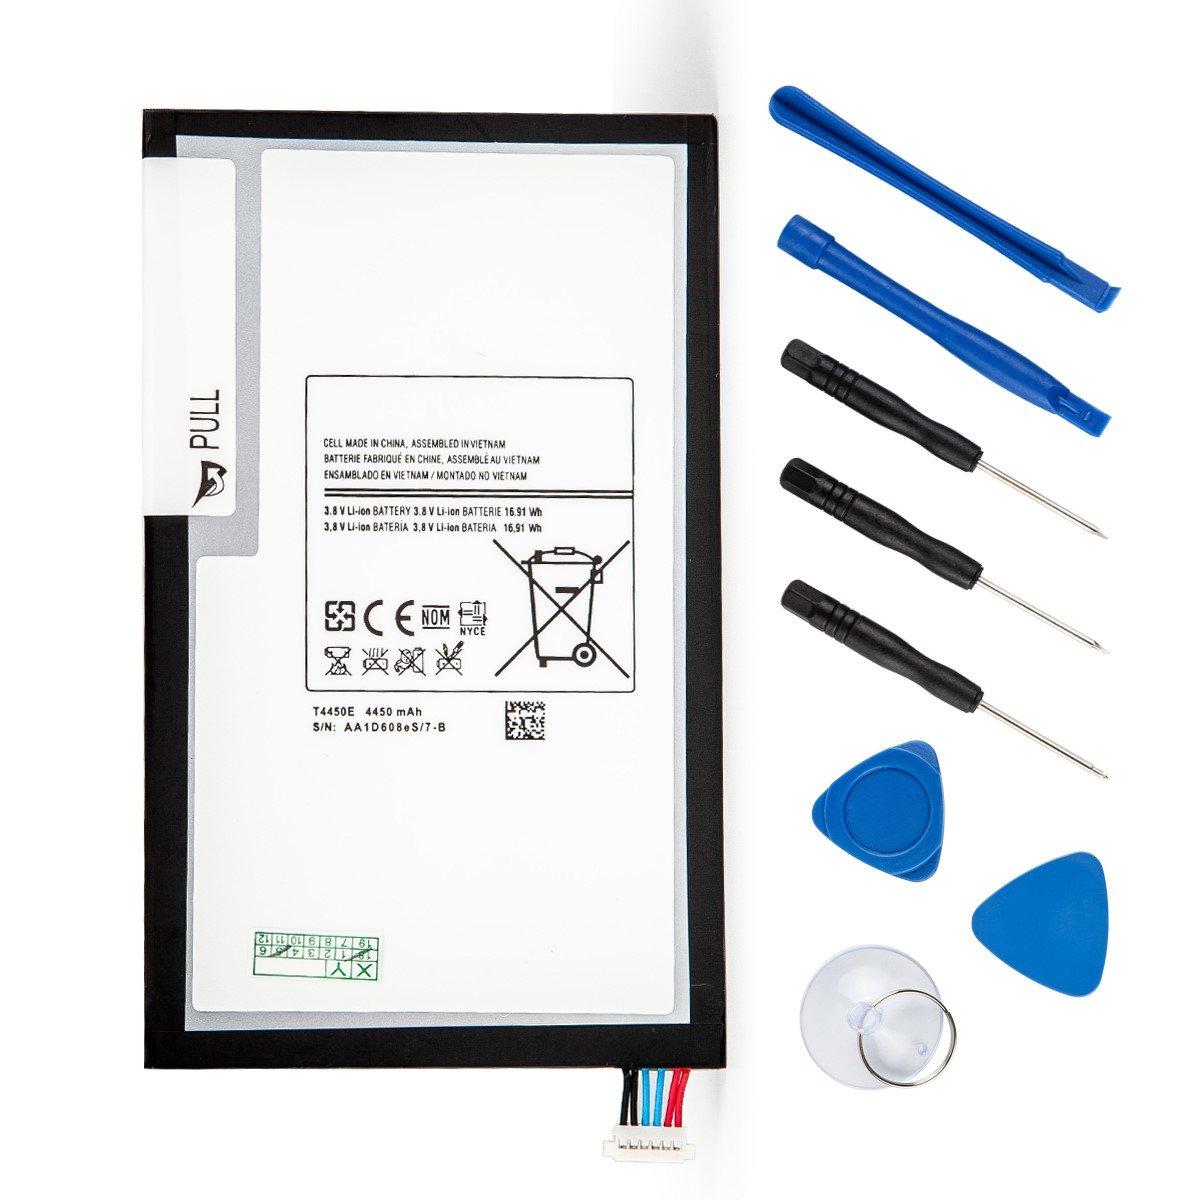 Bateria Tablet T4450E para Samsung Tab 3 8.0 Batteries con T